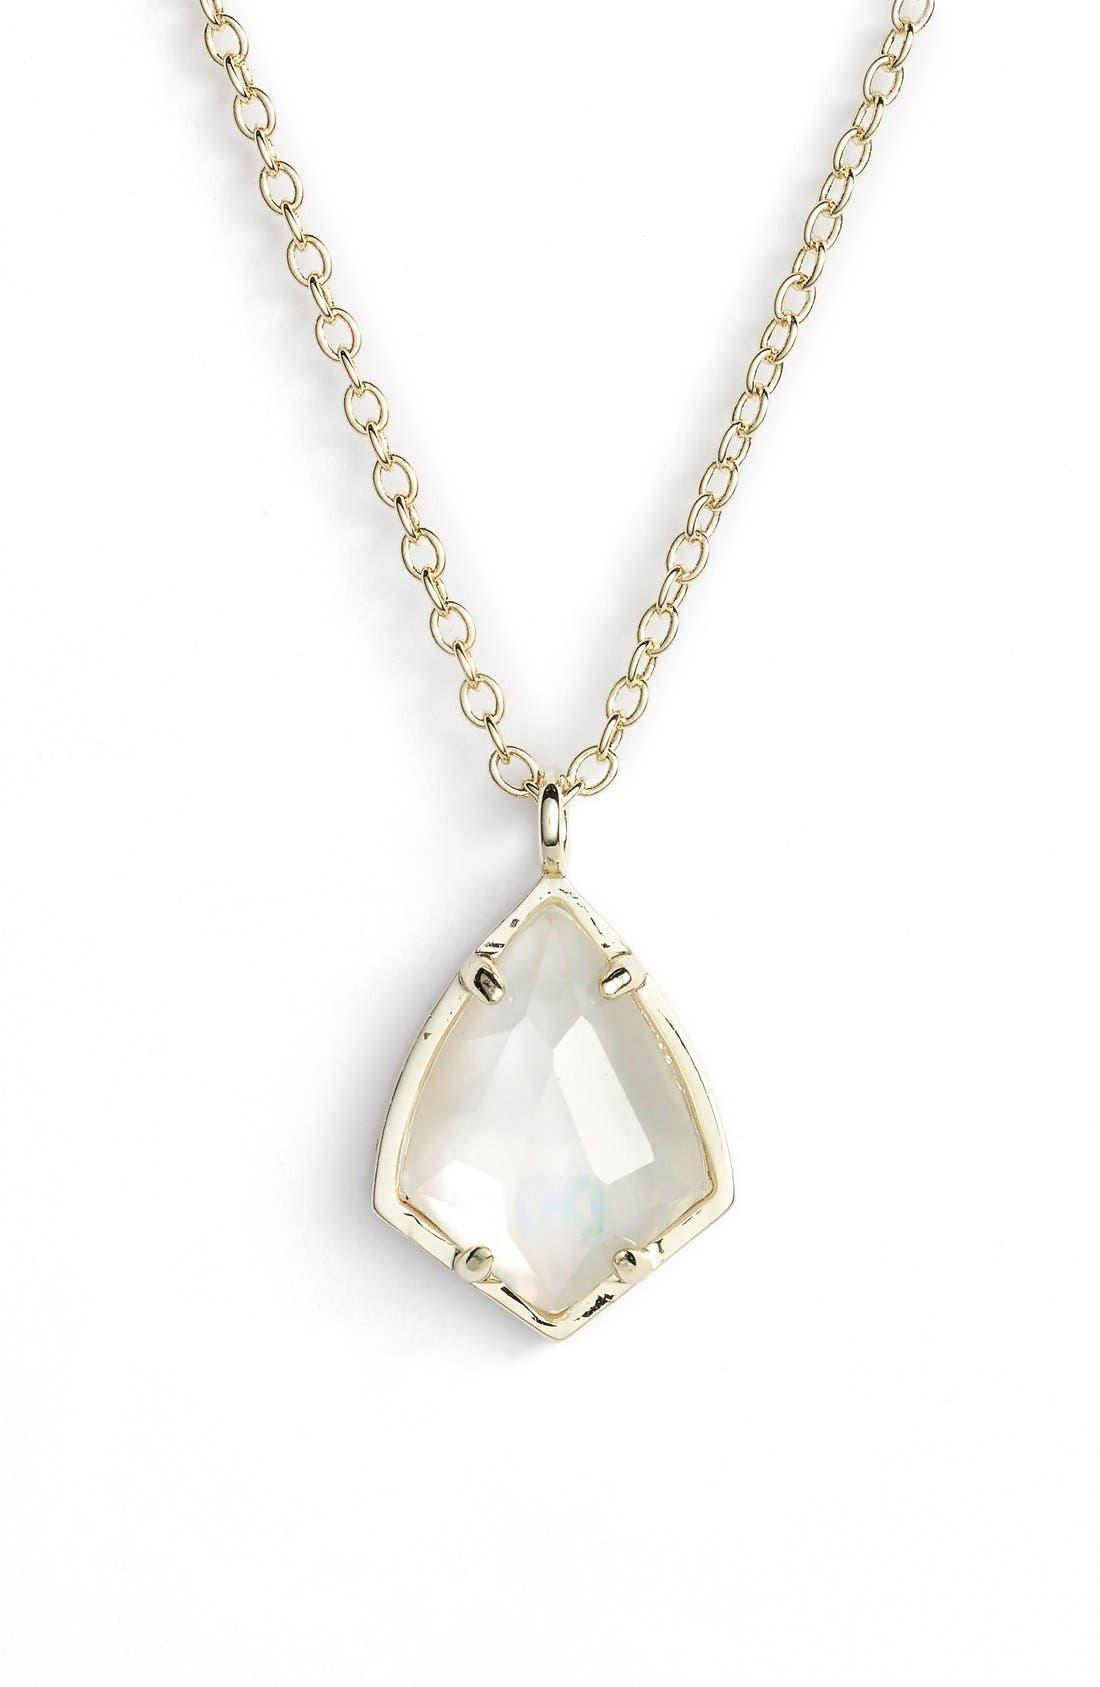 Main Image - Kendra Scott 'Cory' Semiprecious Stone Pendant Necklace